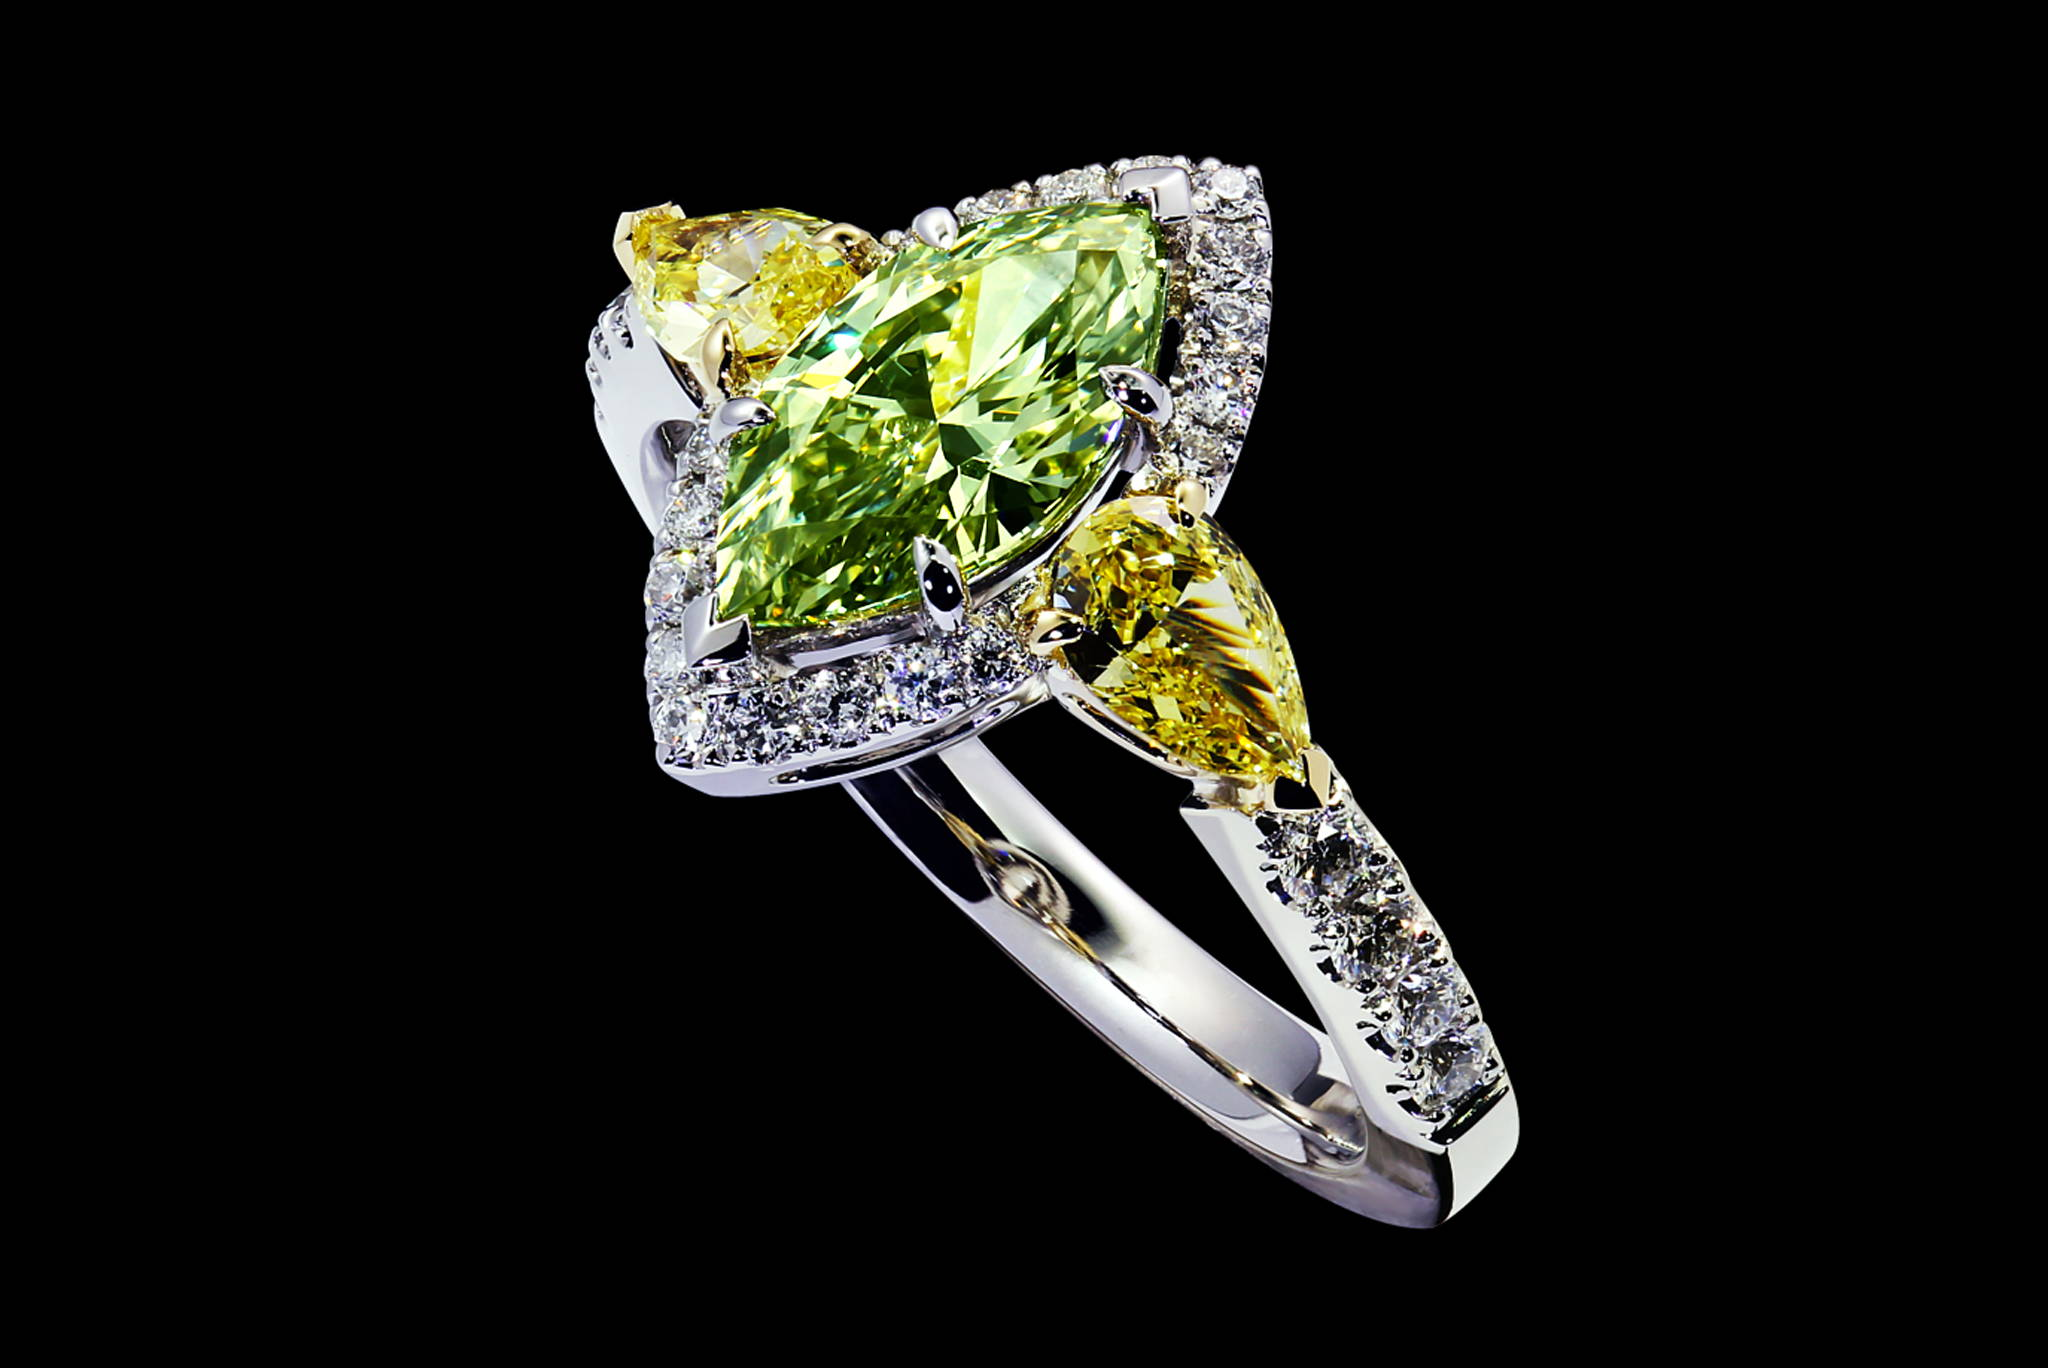 La Chartreuse Colored Diamond Ring 45 degrees view